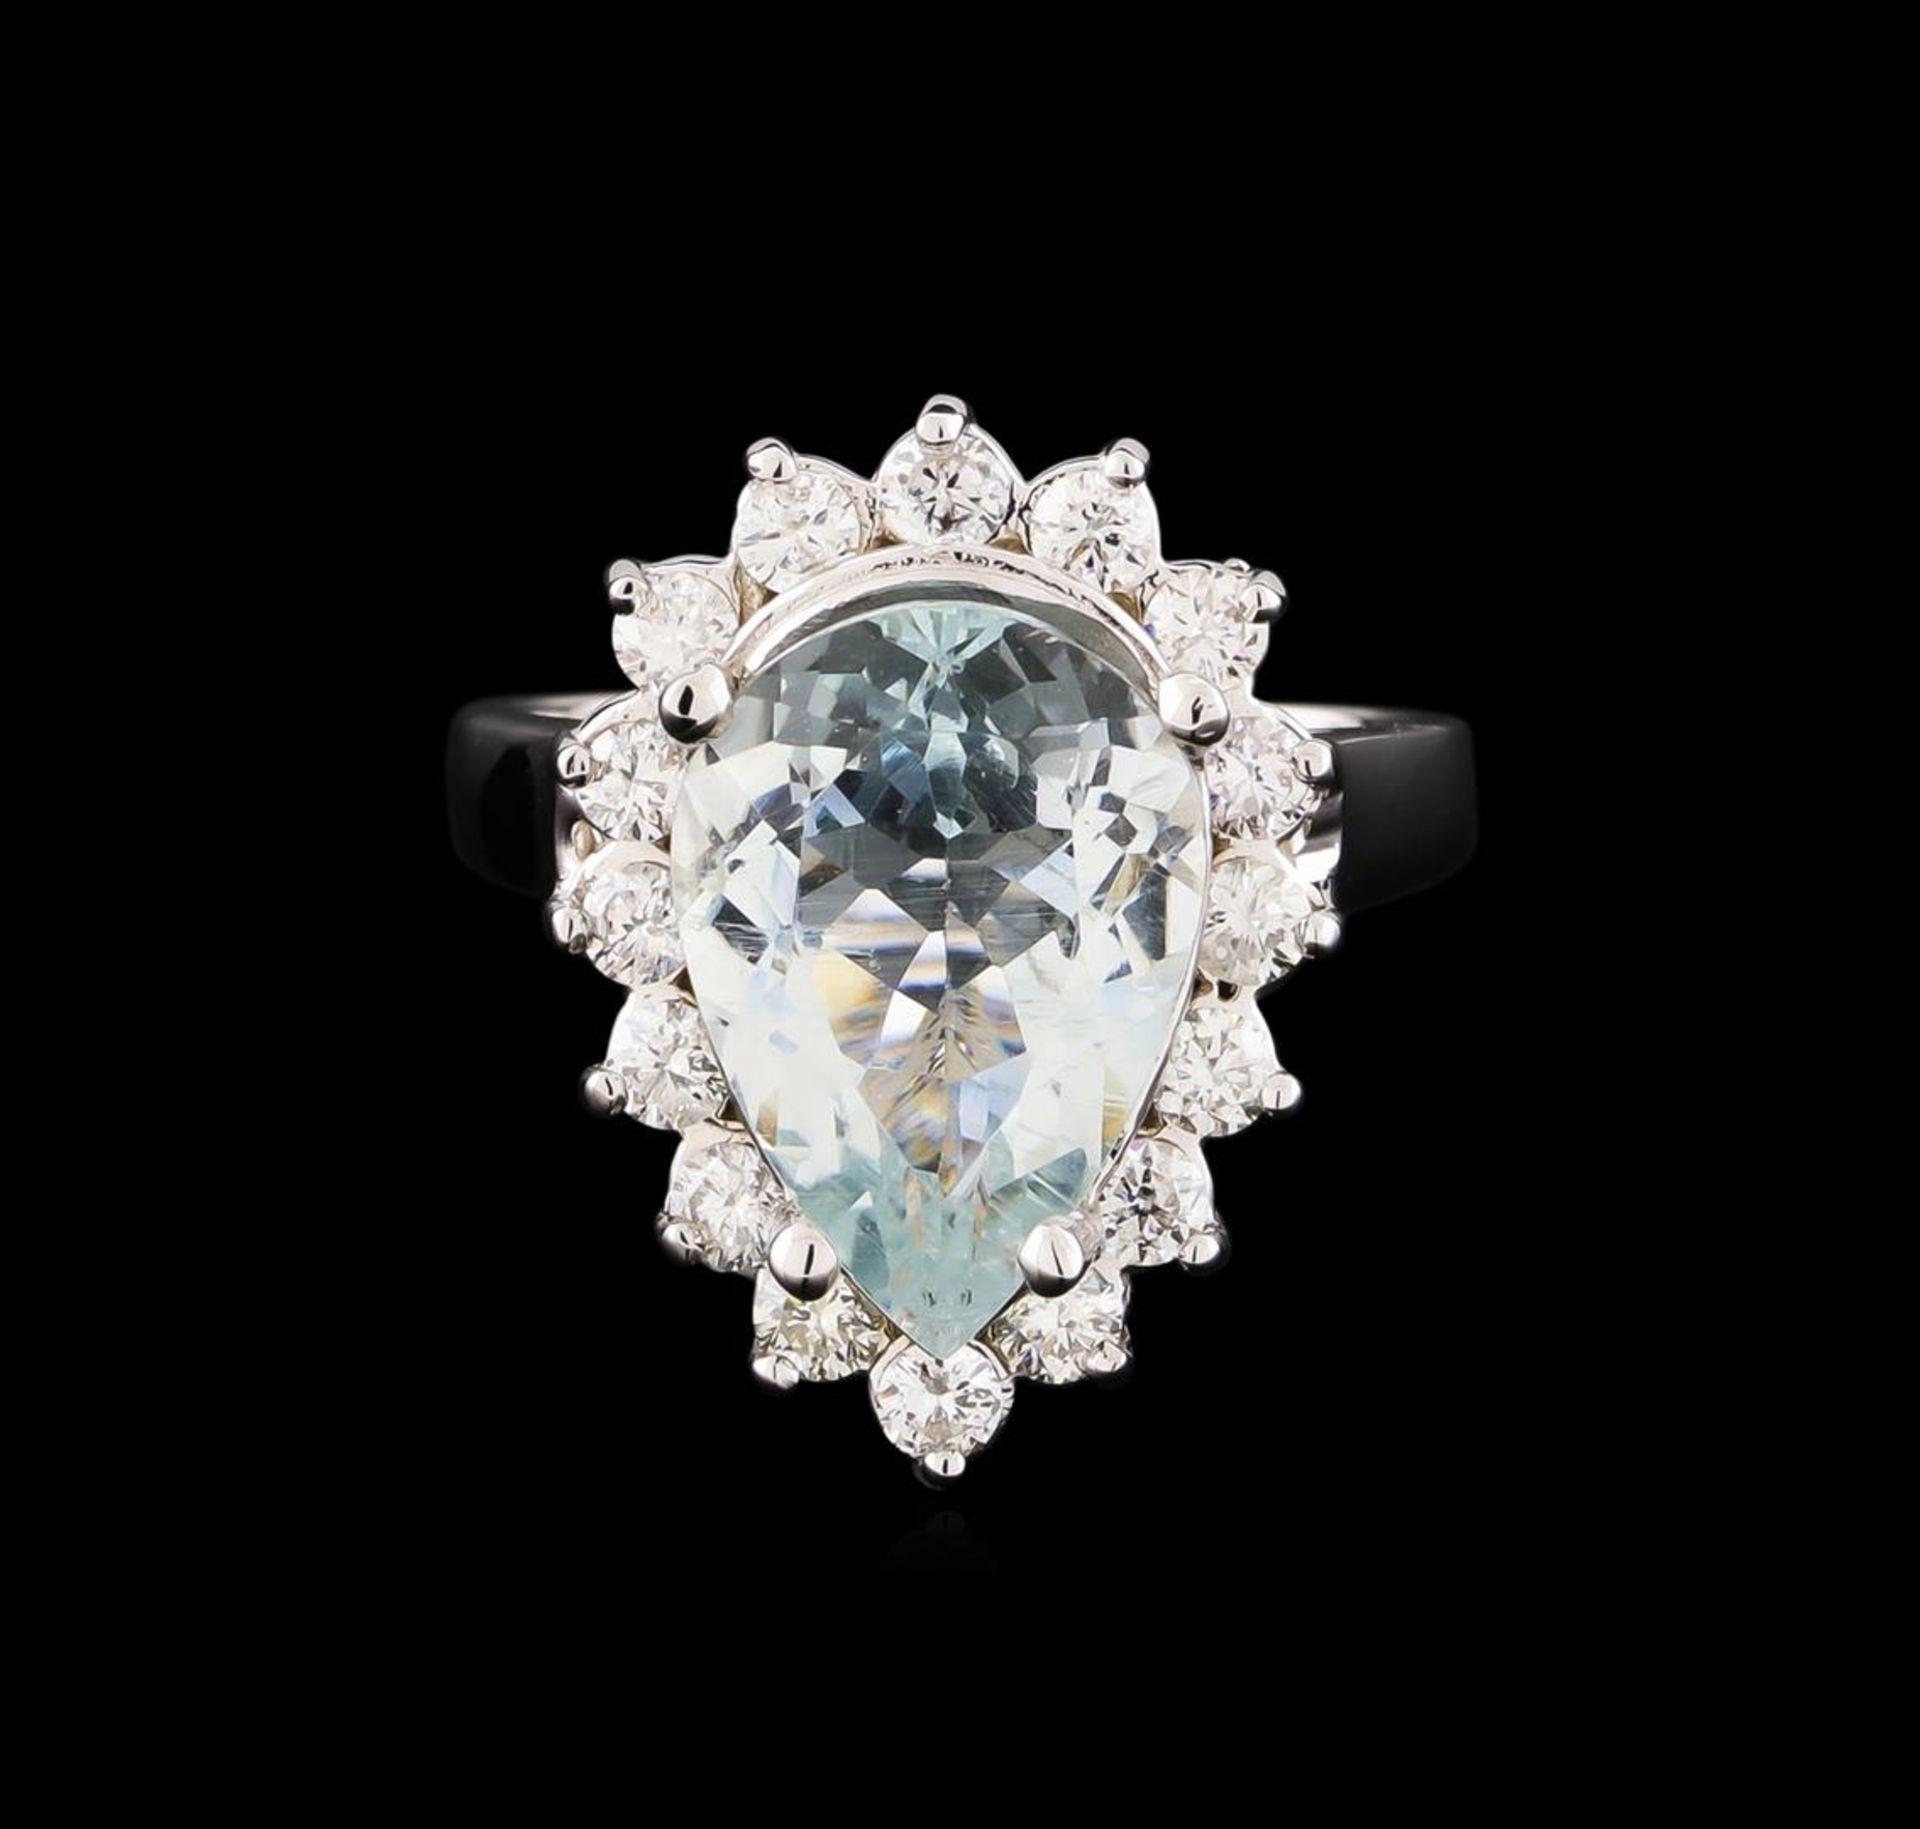 4.48 ctw Aquamarine and Diamond Ring - 14KT White Gold - Image 2 of 5